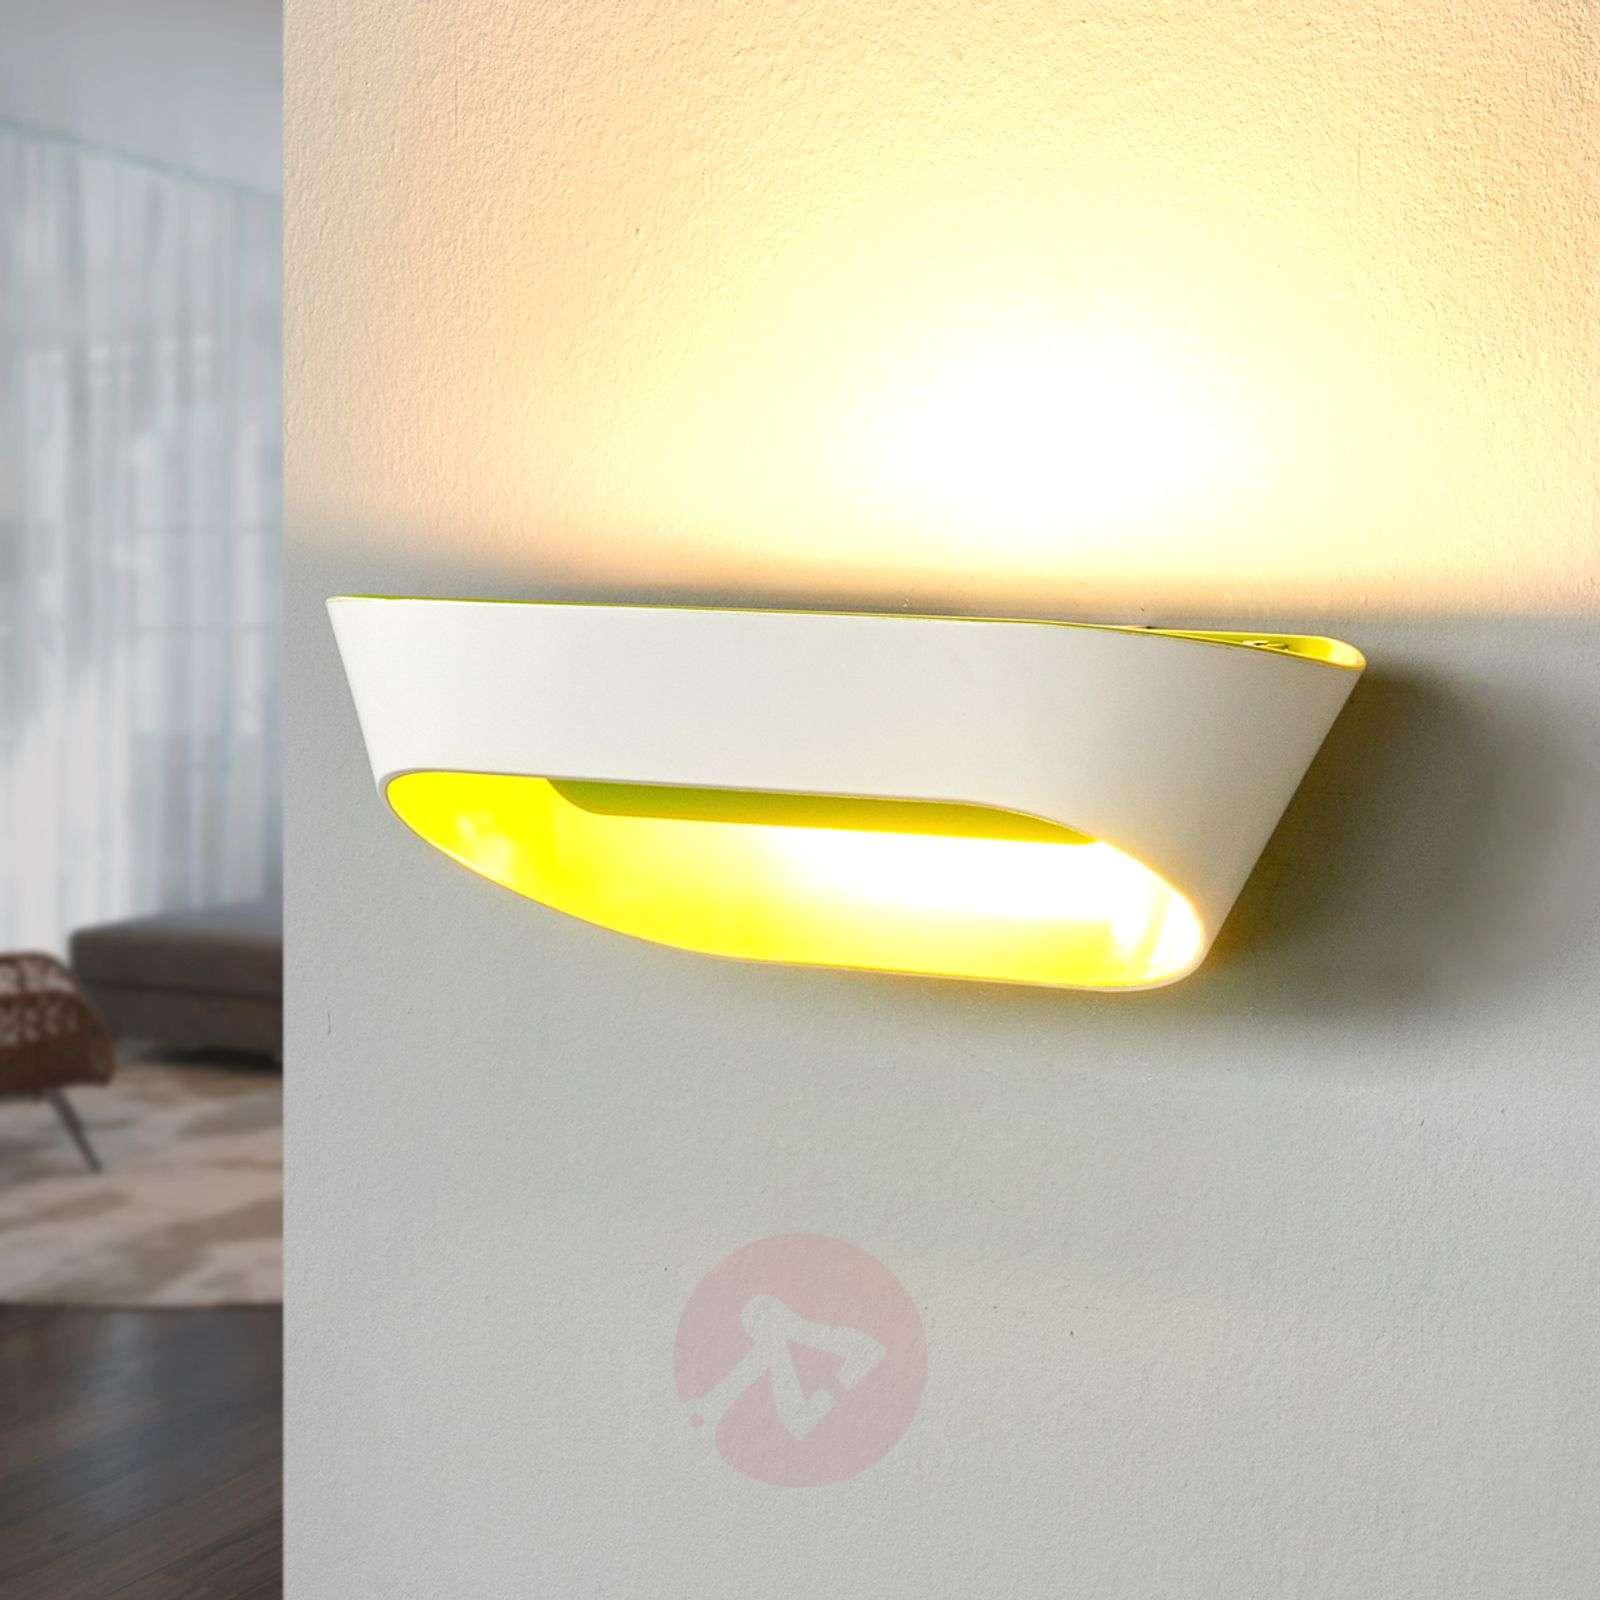 JK indirect-shining wall light-7265015X-03